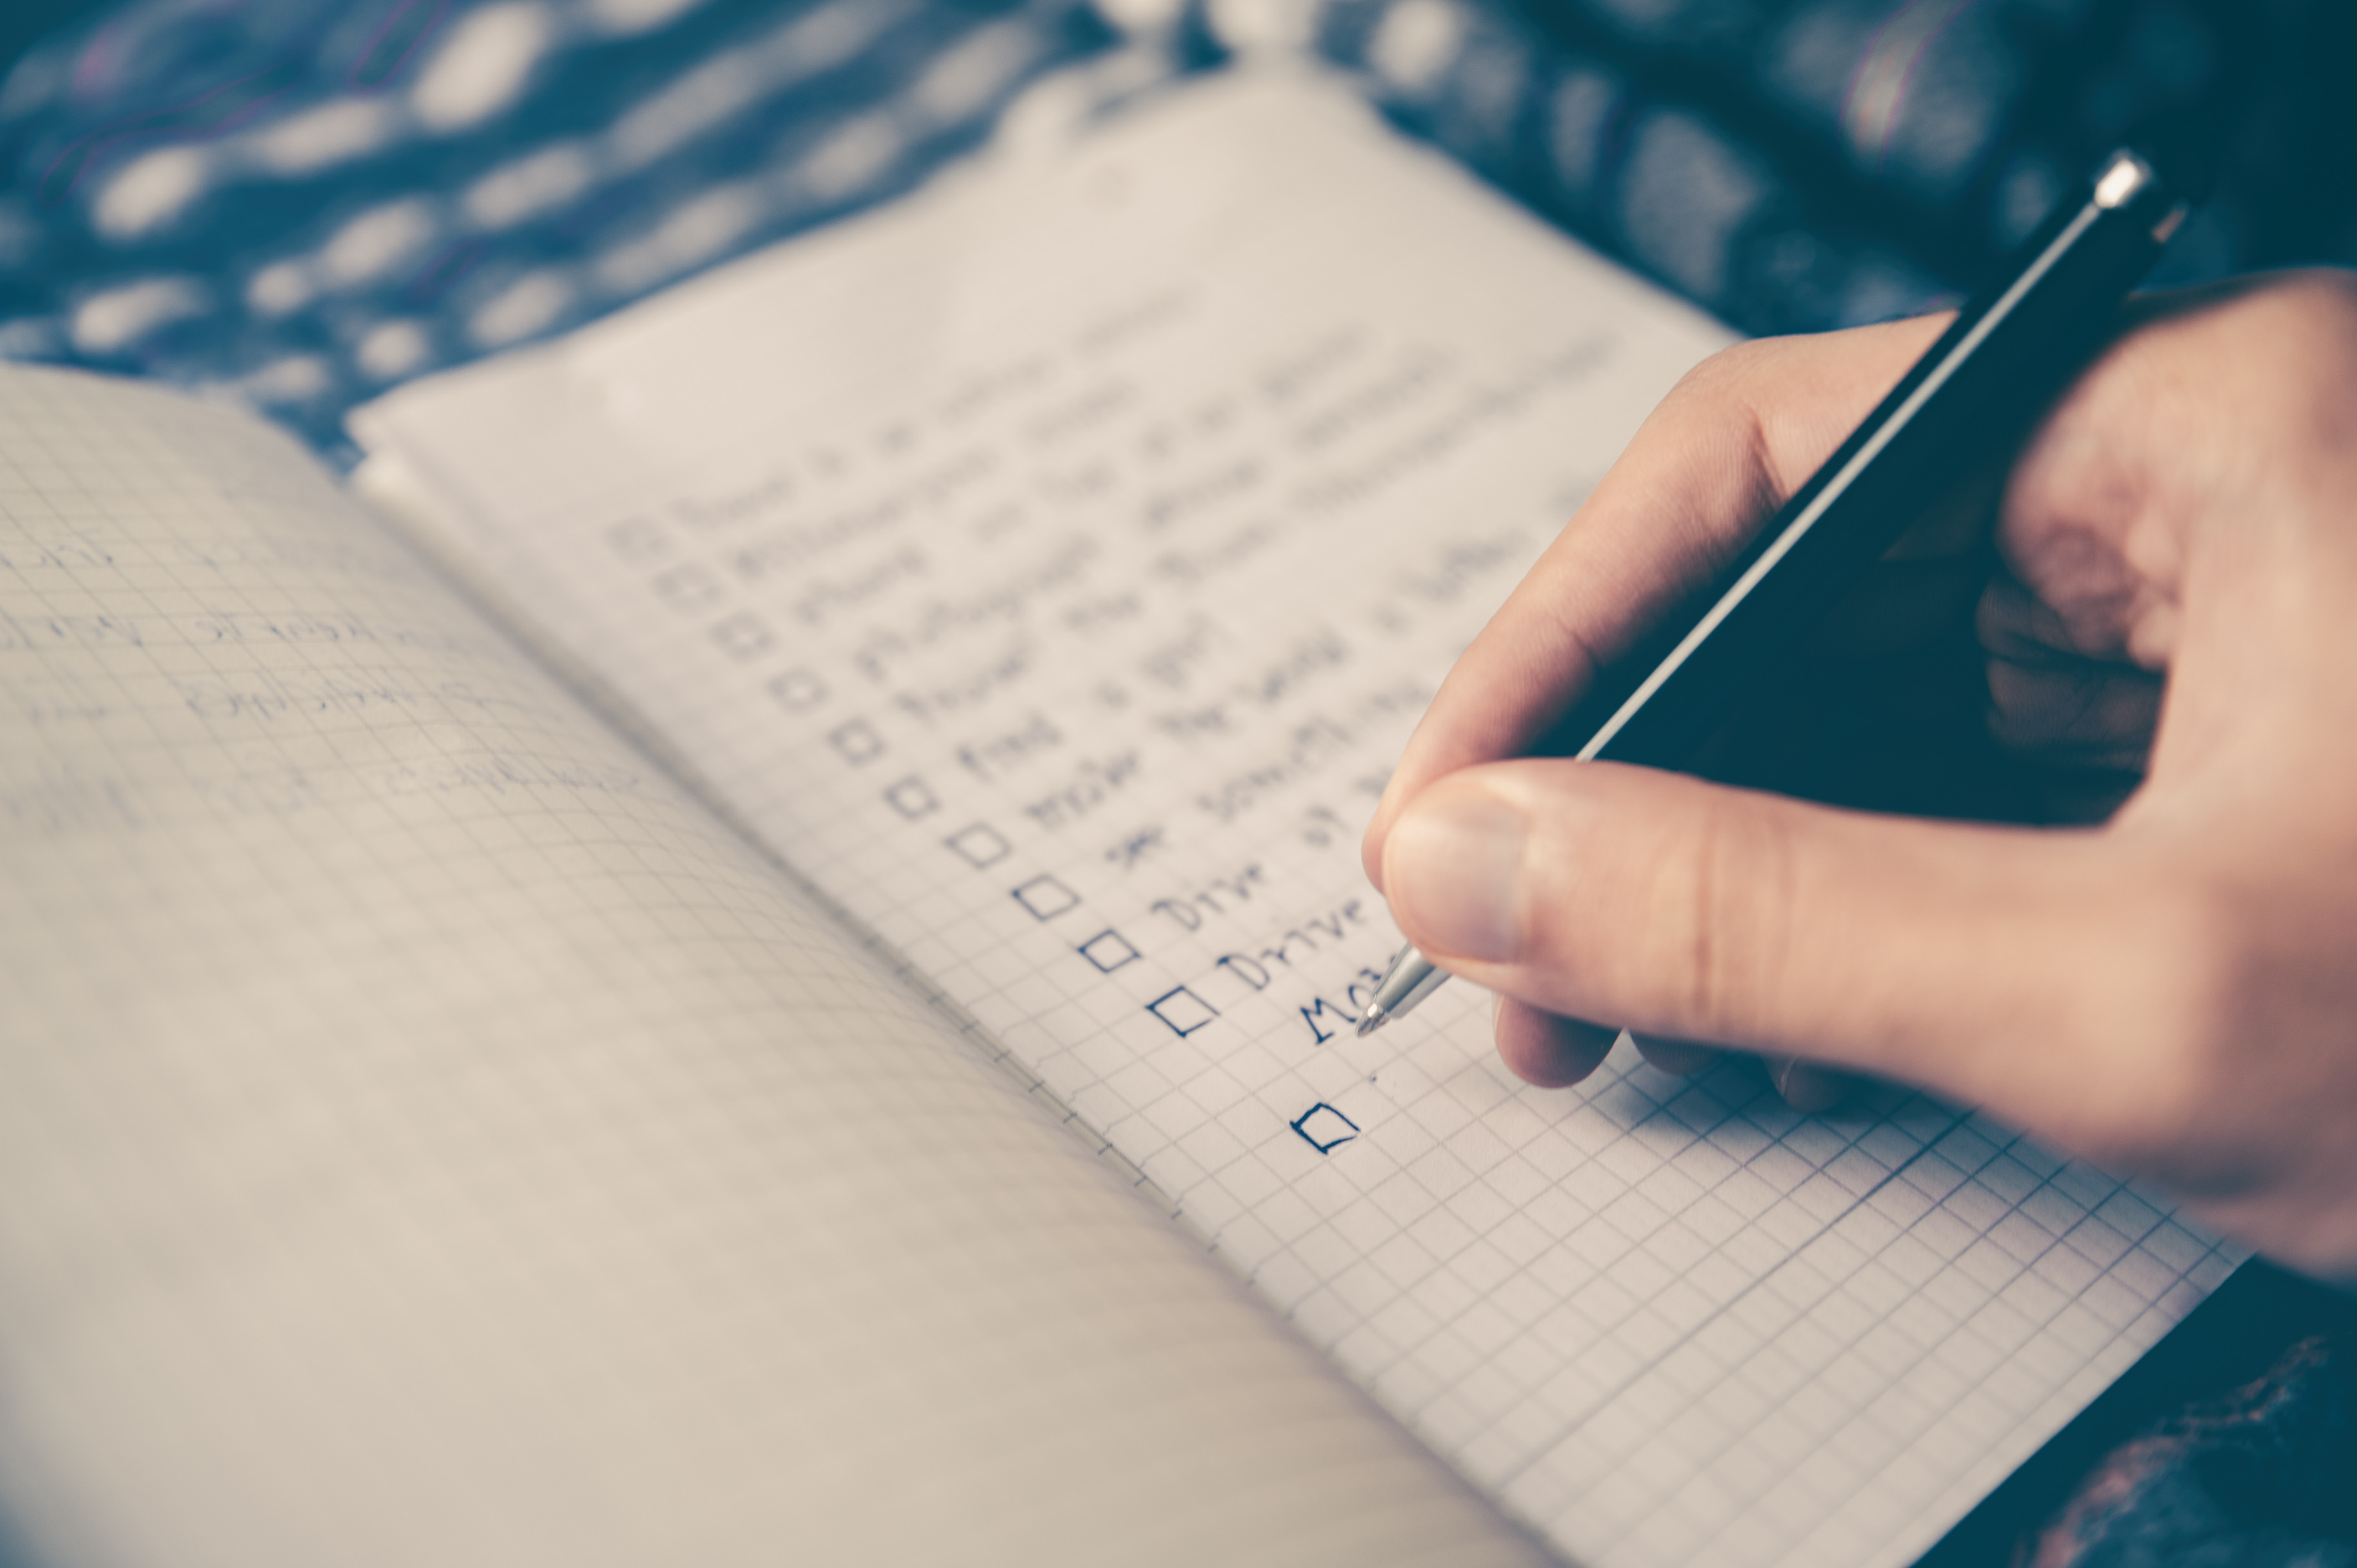 a person writing a checklist